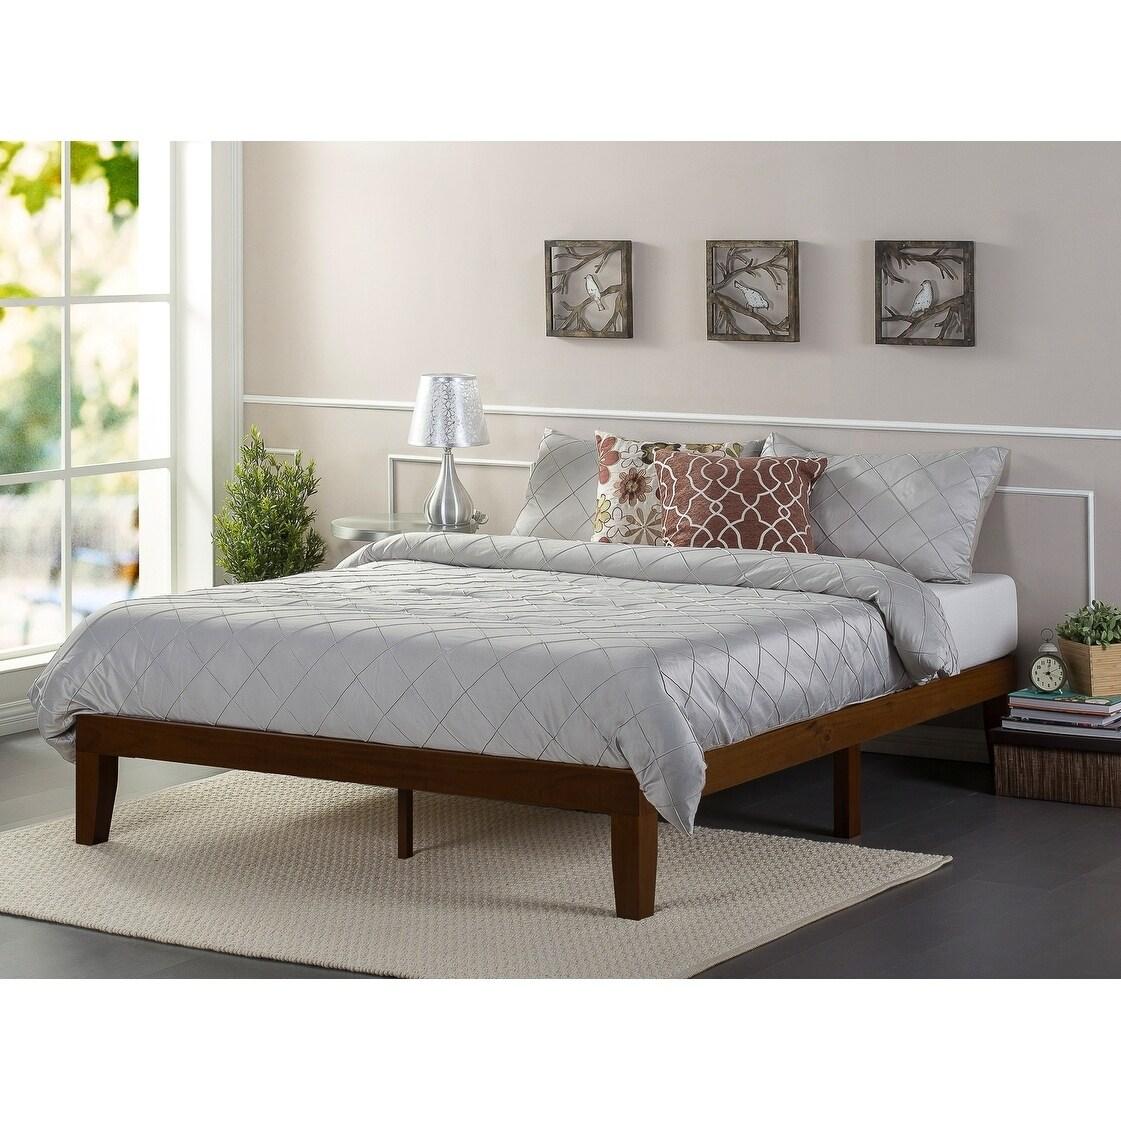 Priage Antique Espresso 12-inch Solid Wood Platform Bed (...